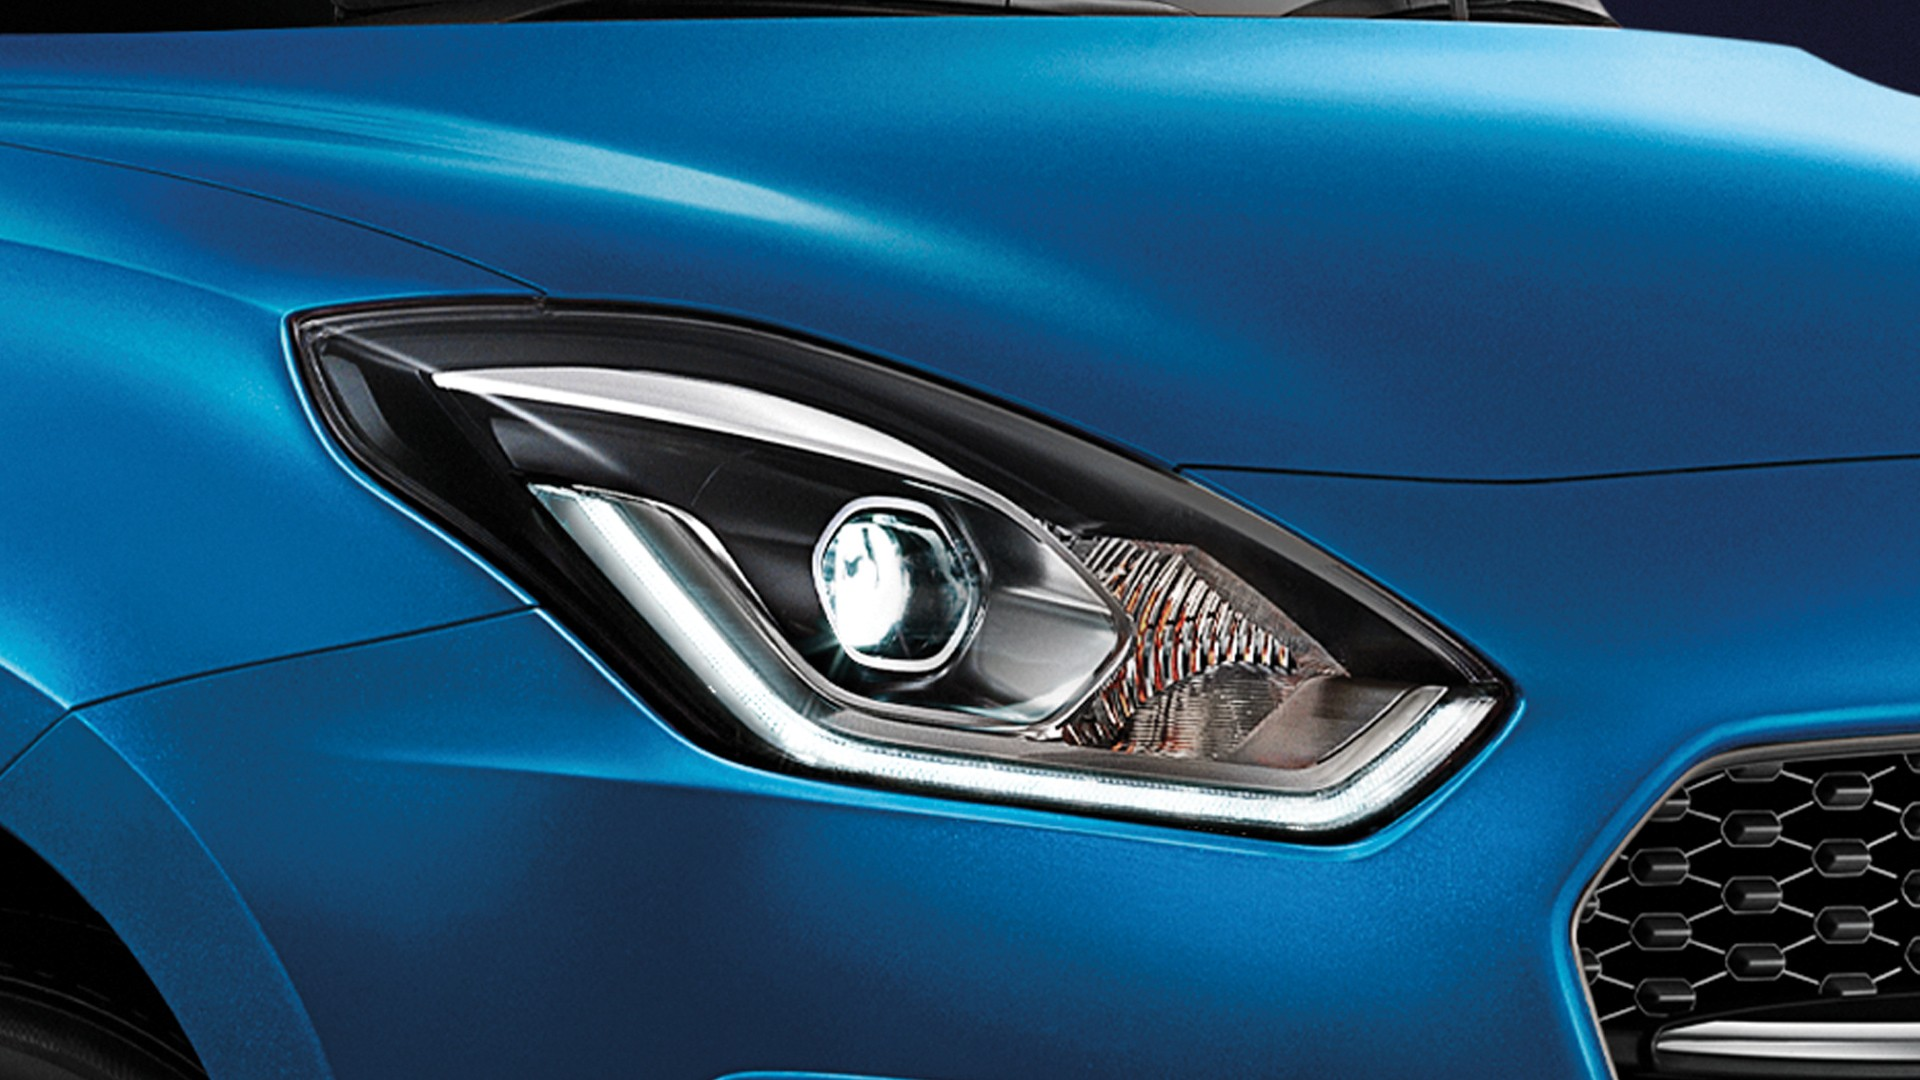 New Suzuki Swift ไฟหน้า LED โปรเจคเตอร์ พร้อม Daytime Running Light